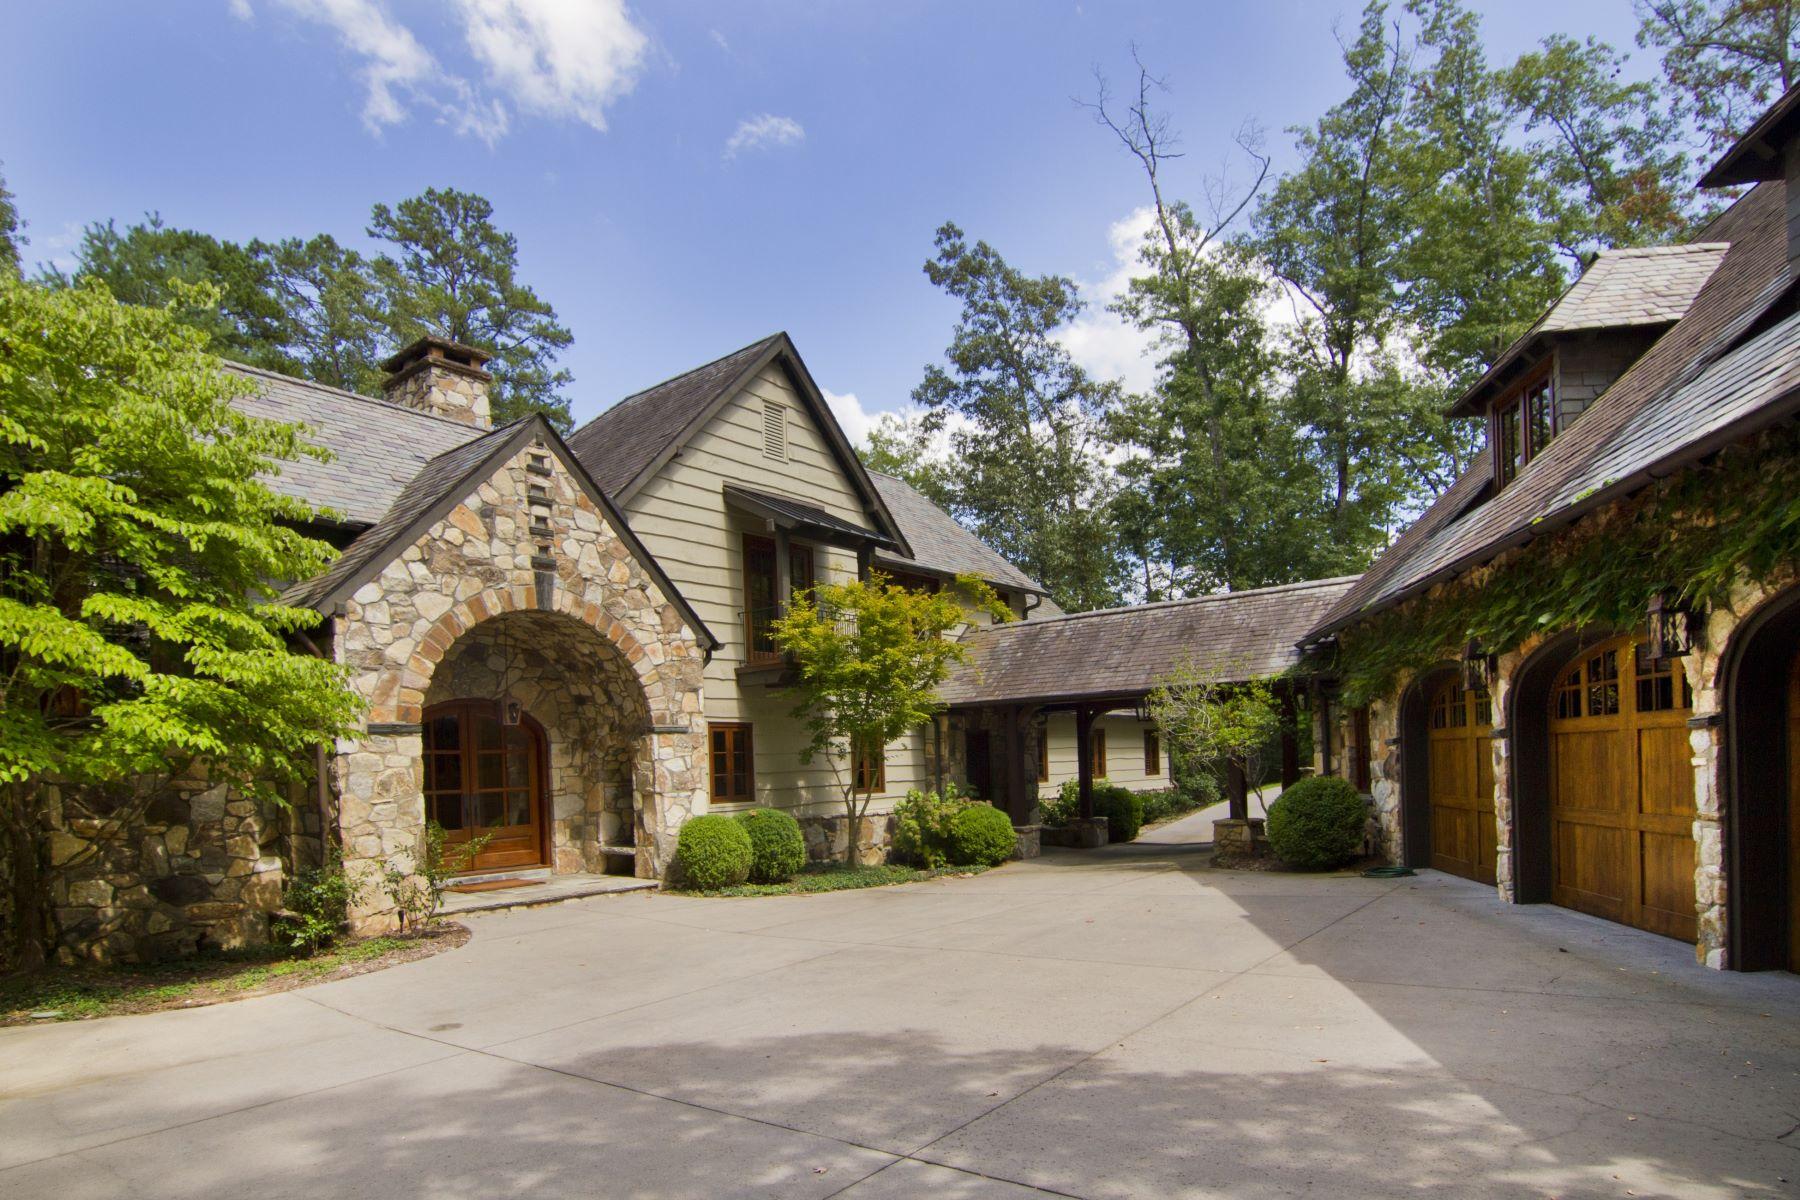 Villa per Vendita alle ore English Country Meets Mountain Lake 305 Kingfisher Lane The Cliffs At Keowee Falls, Salem, Carolina Del Sud, 29676 Stati Uniti